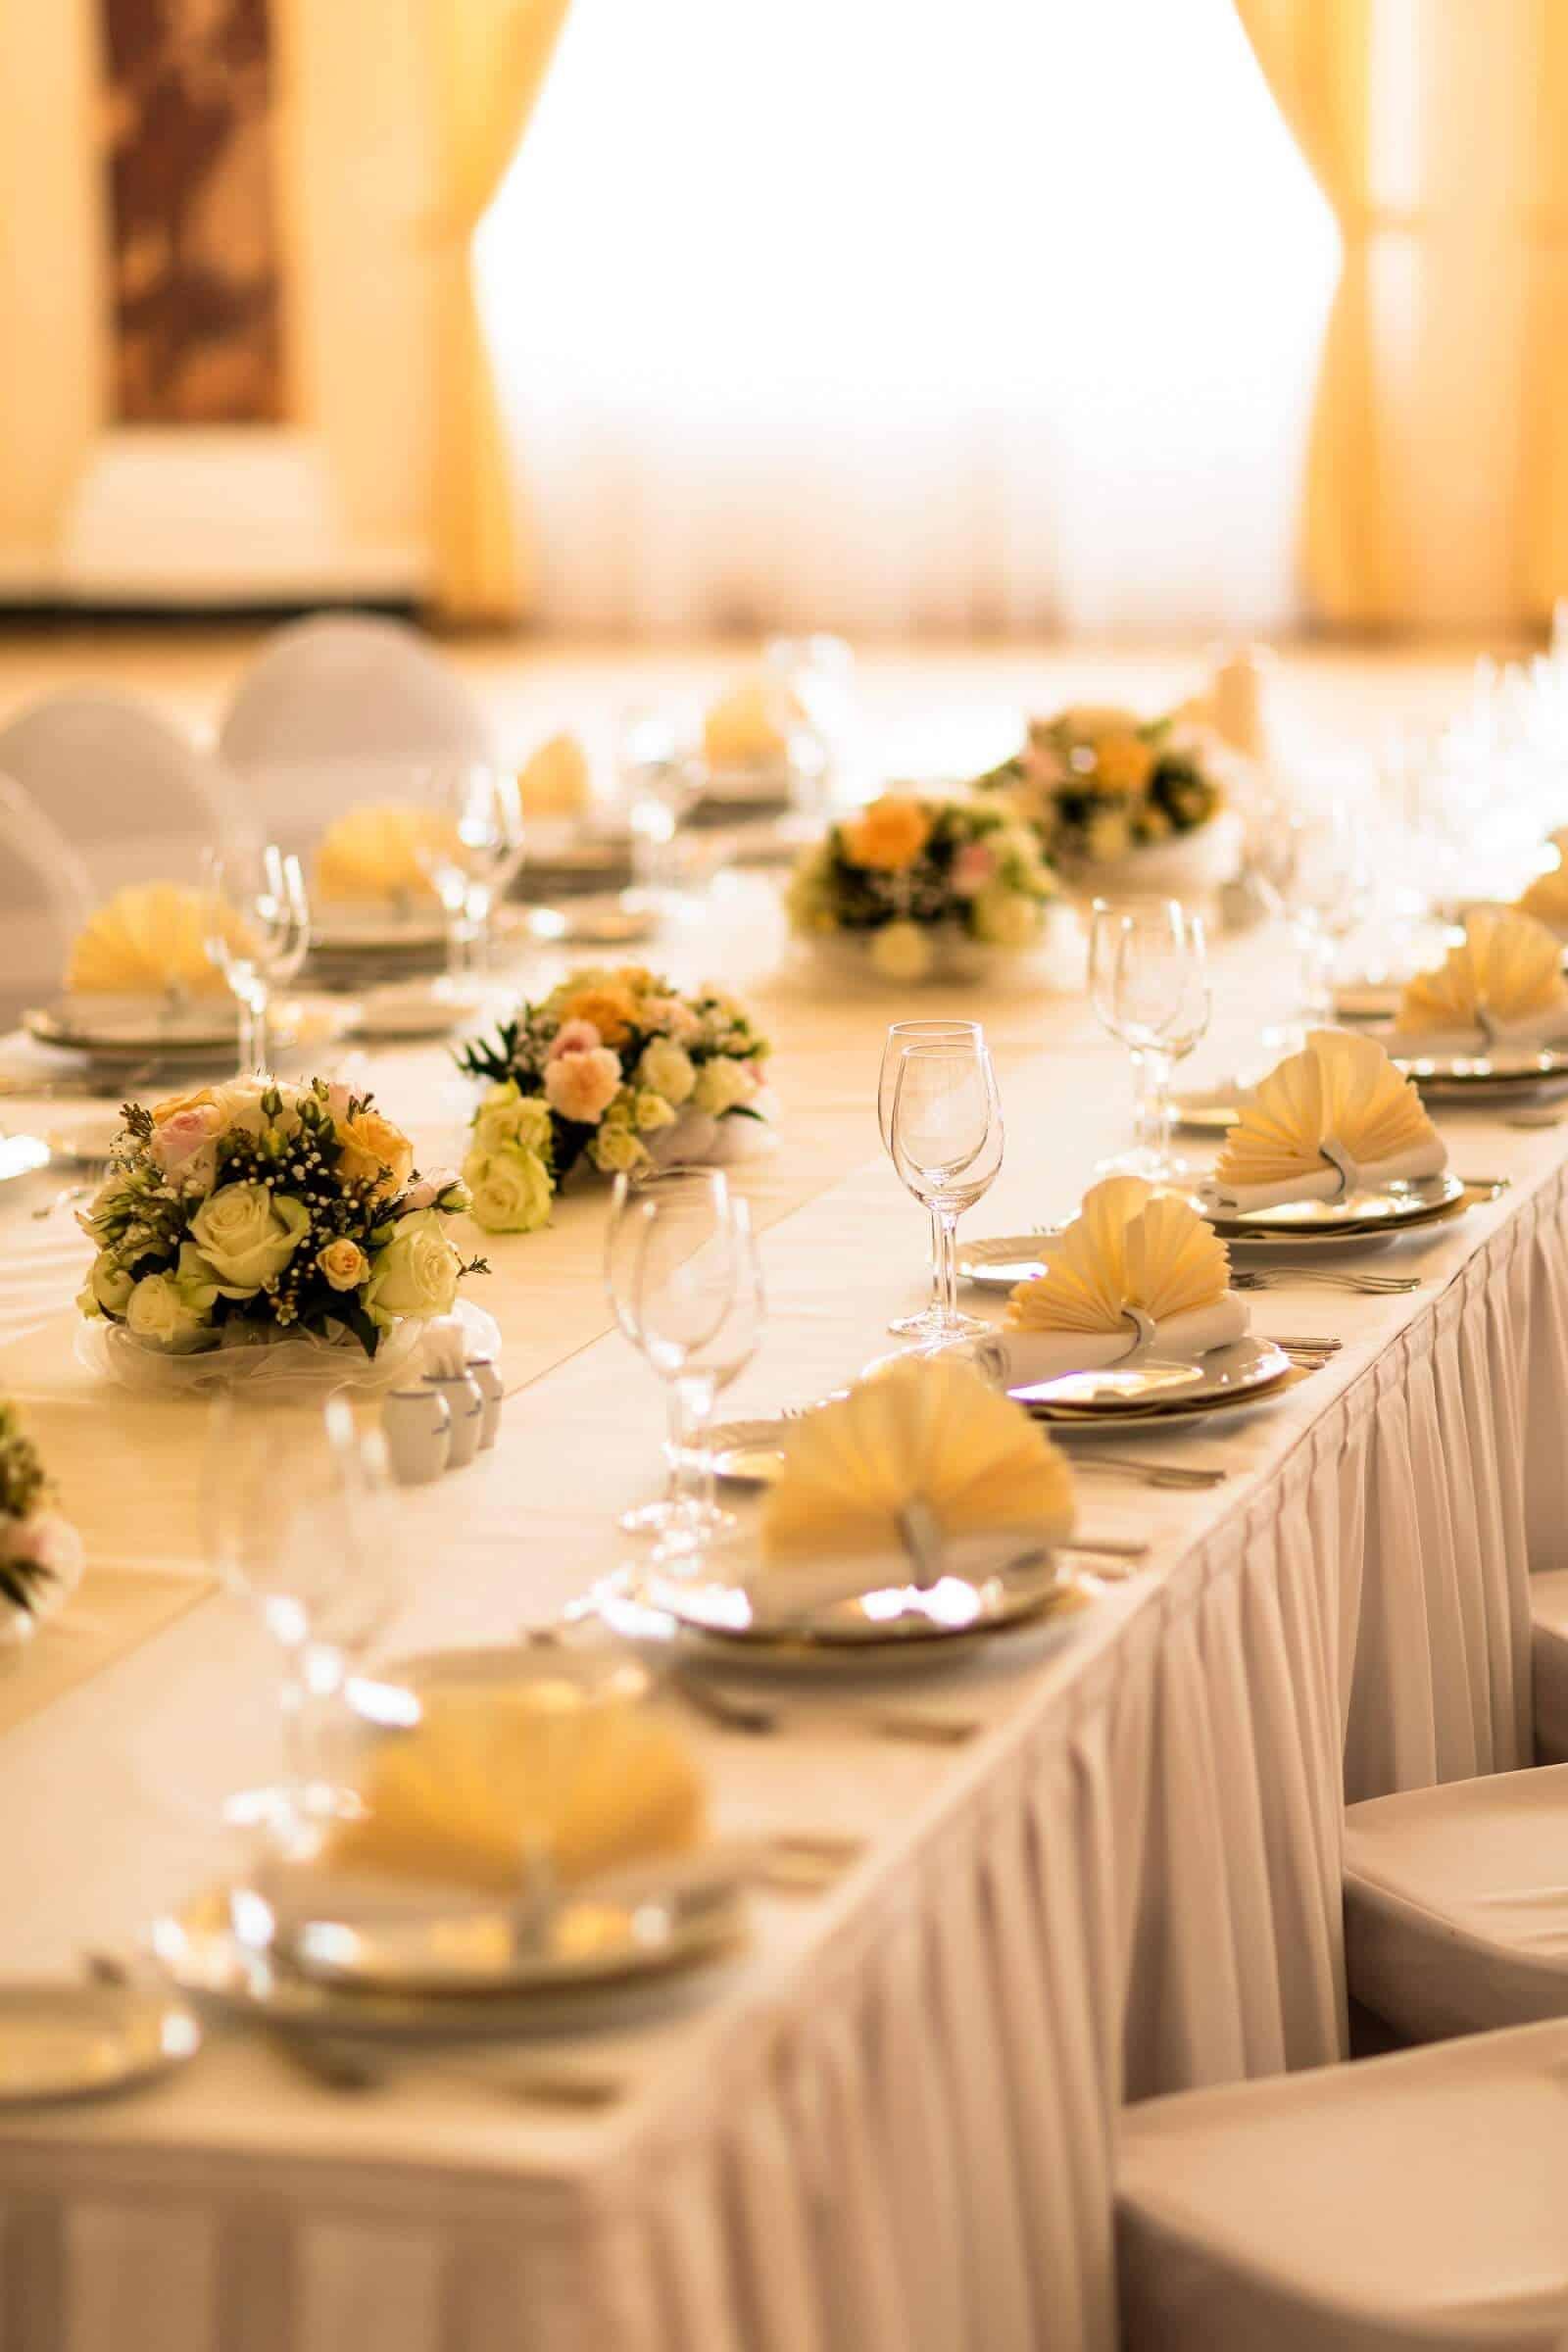 Imperial - svatební hostina